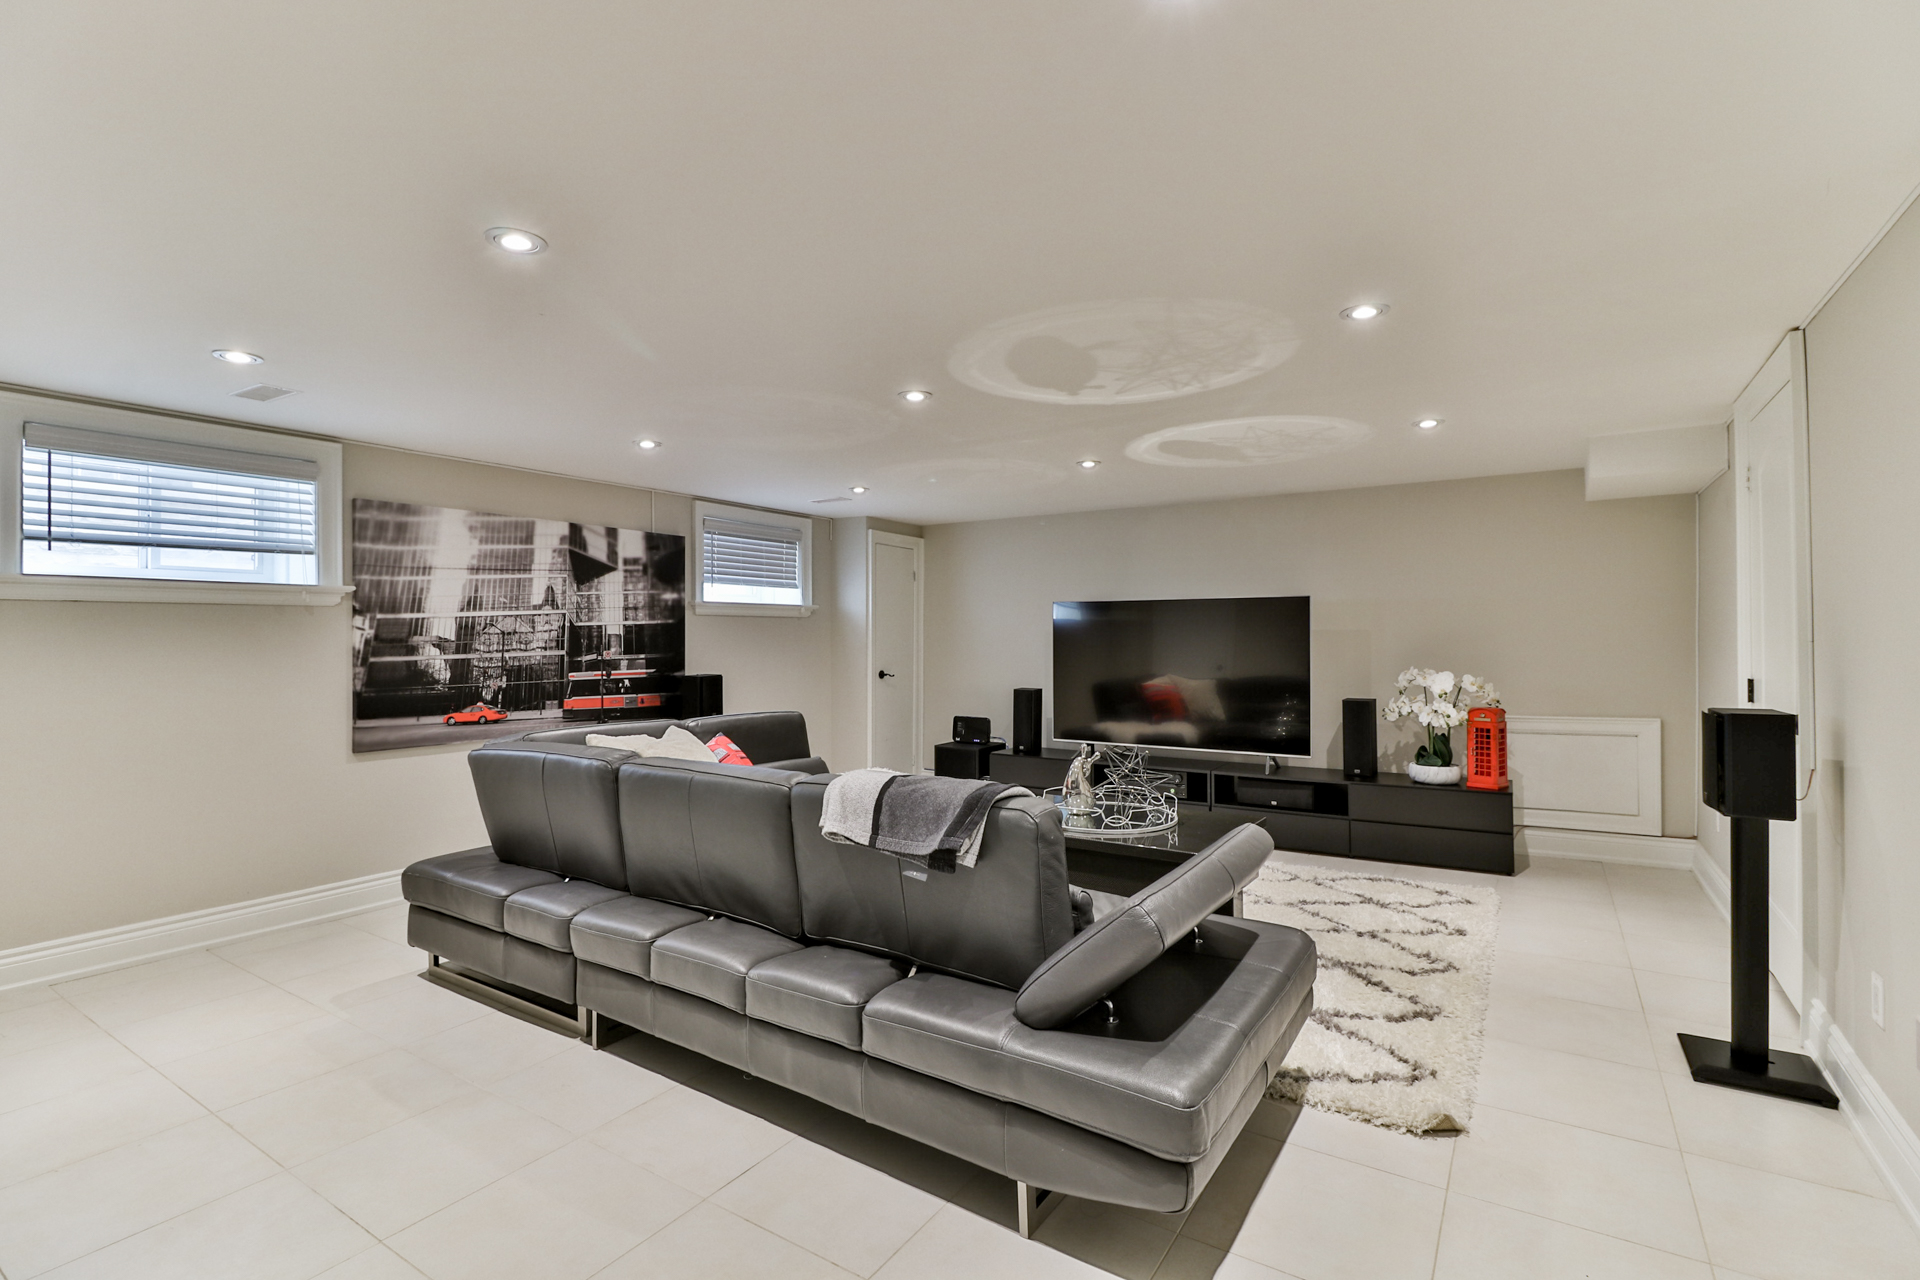 Basement Living Area, 149 Shaver, Etobicoke Home Staging